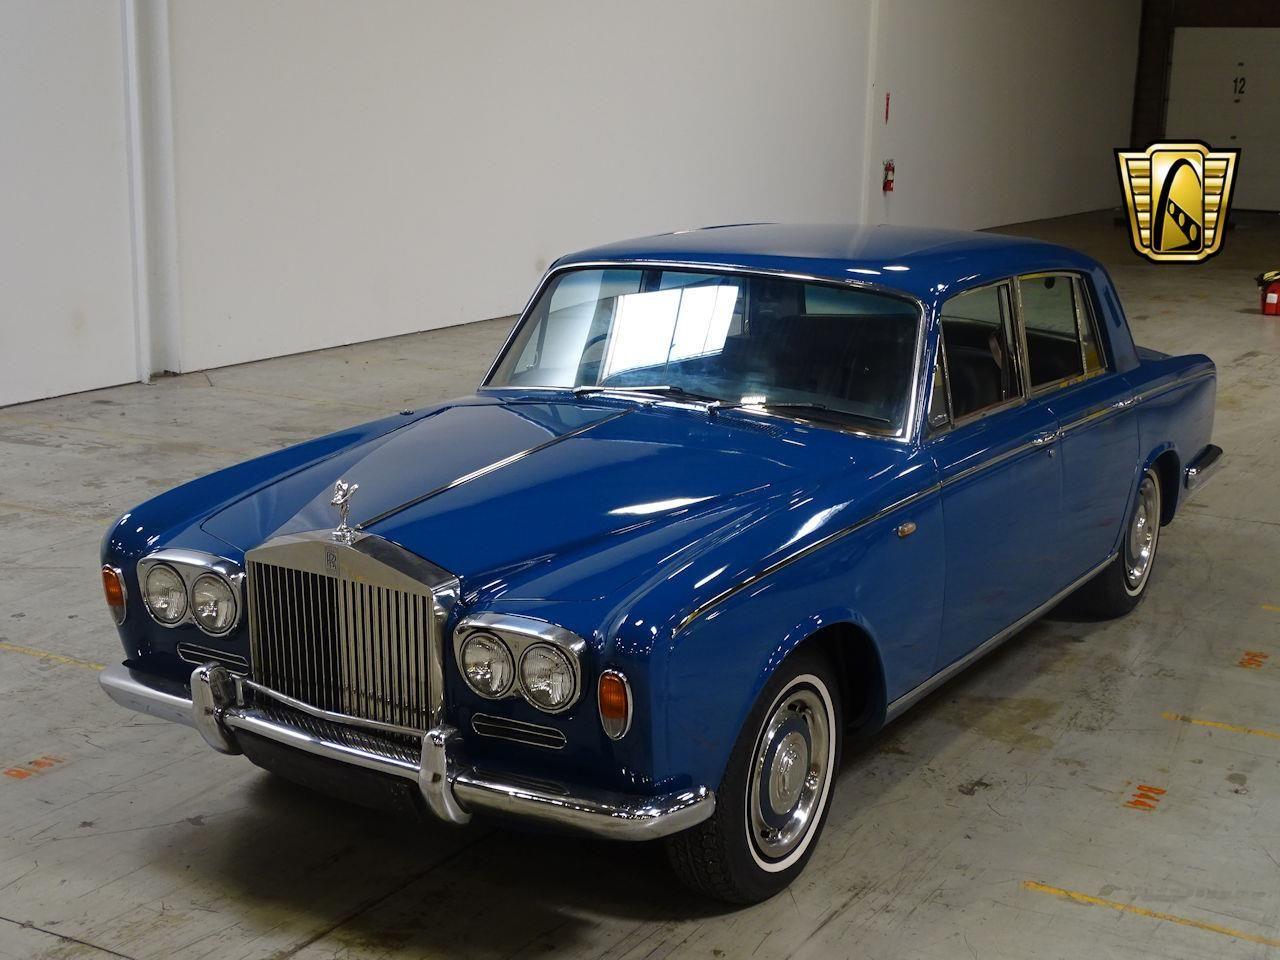 Large Photo of '67 Silver Shadow Rolls royce, Rolls